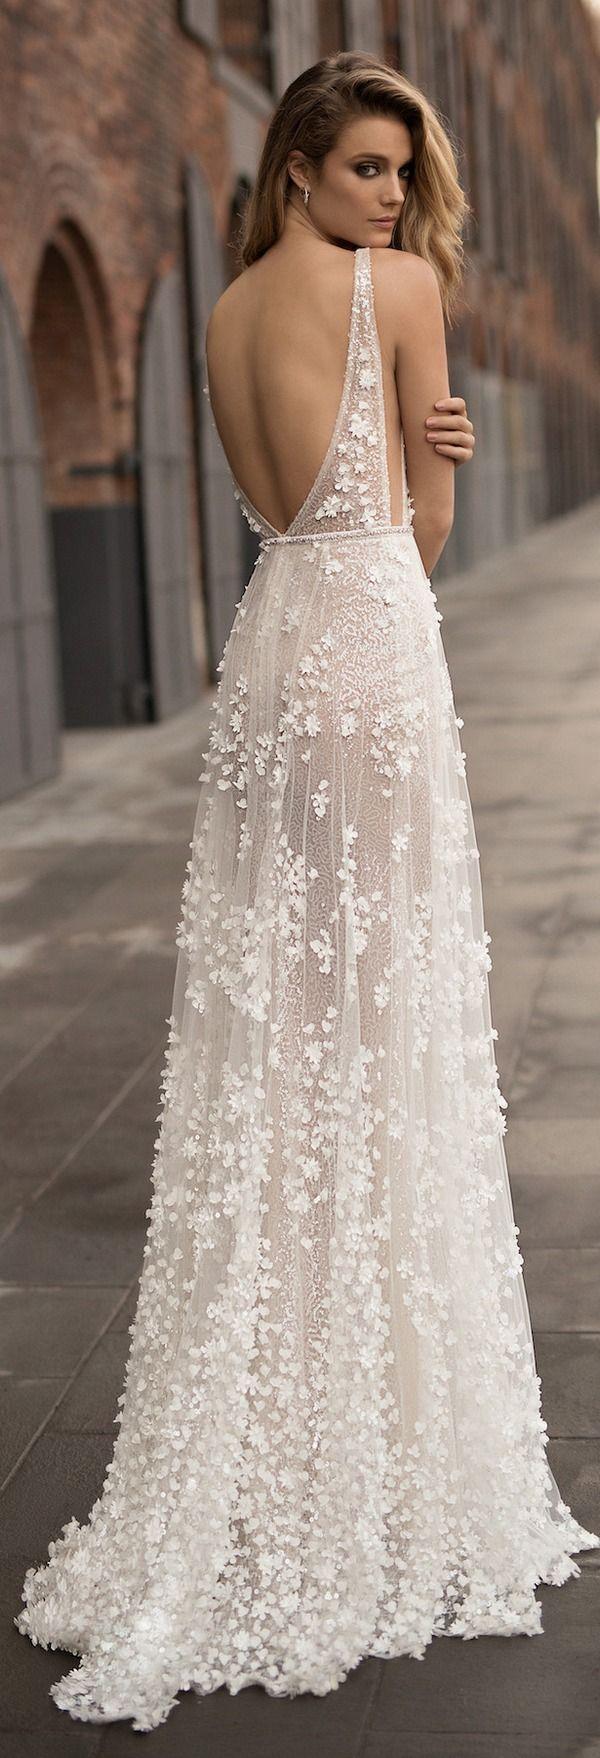 Berta Spring Wedding Dresses 2018 | Spring wedding, Bridal gowns and ...